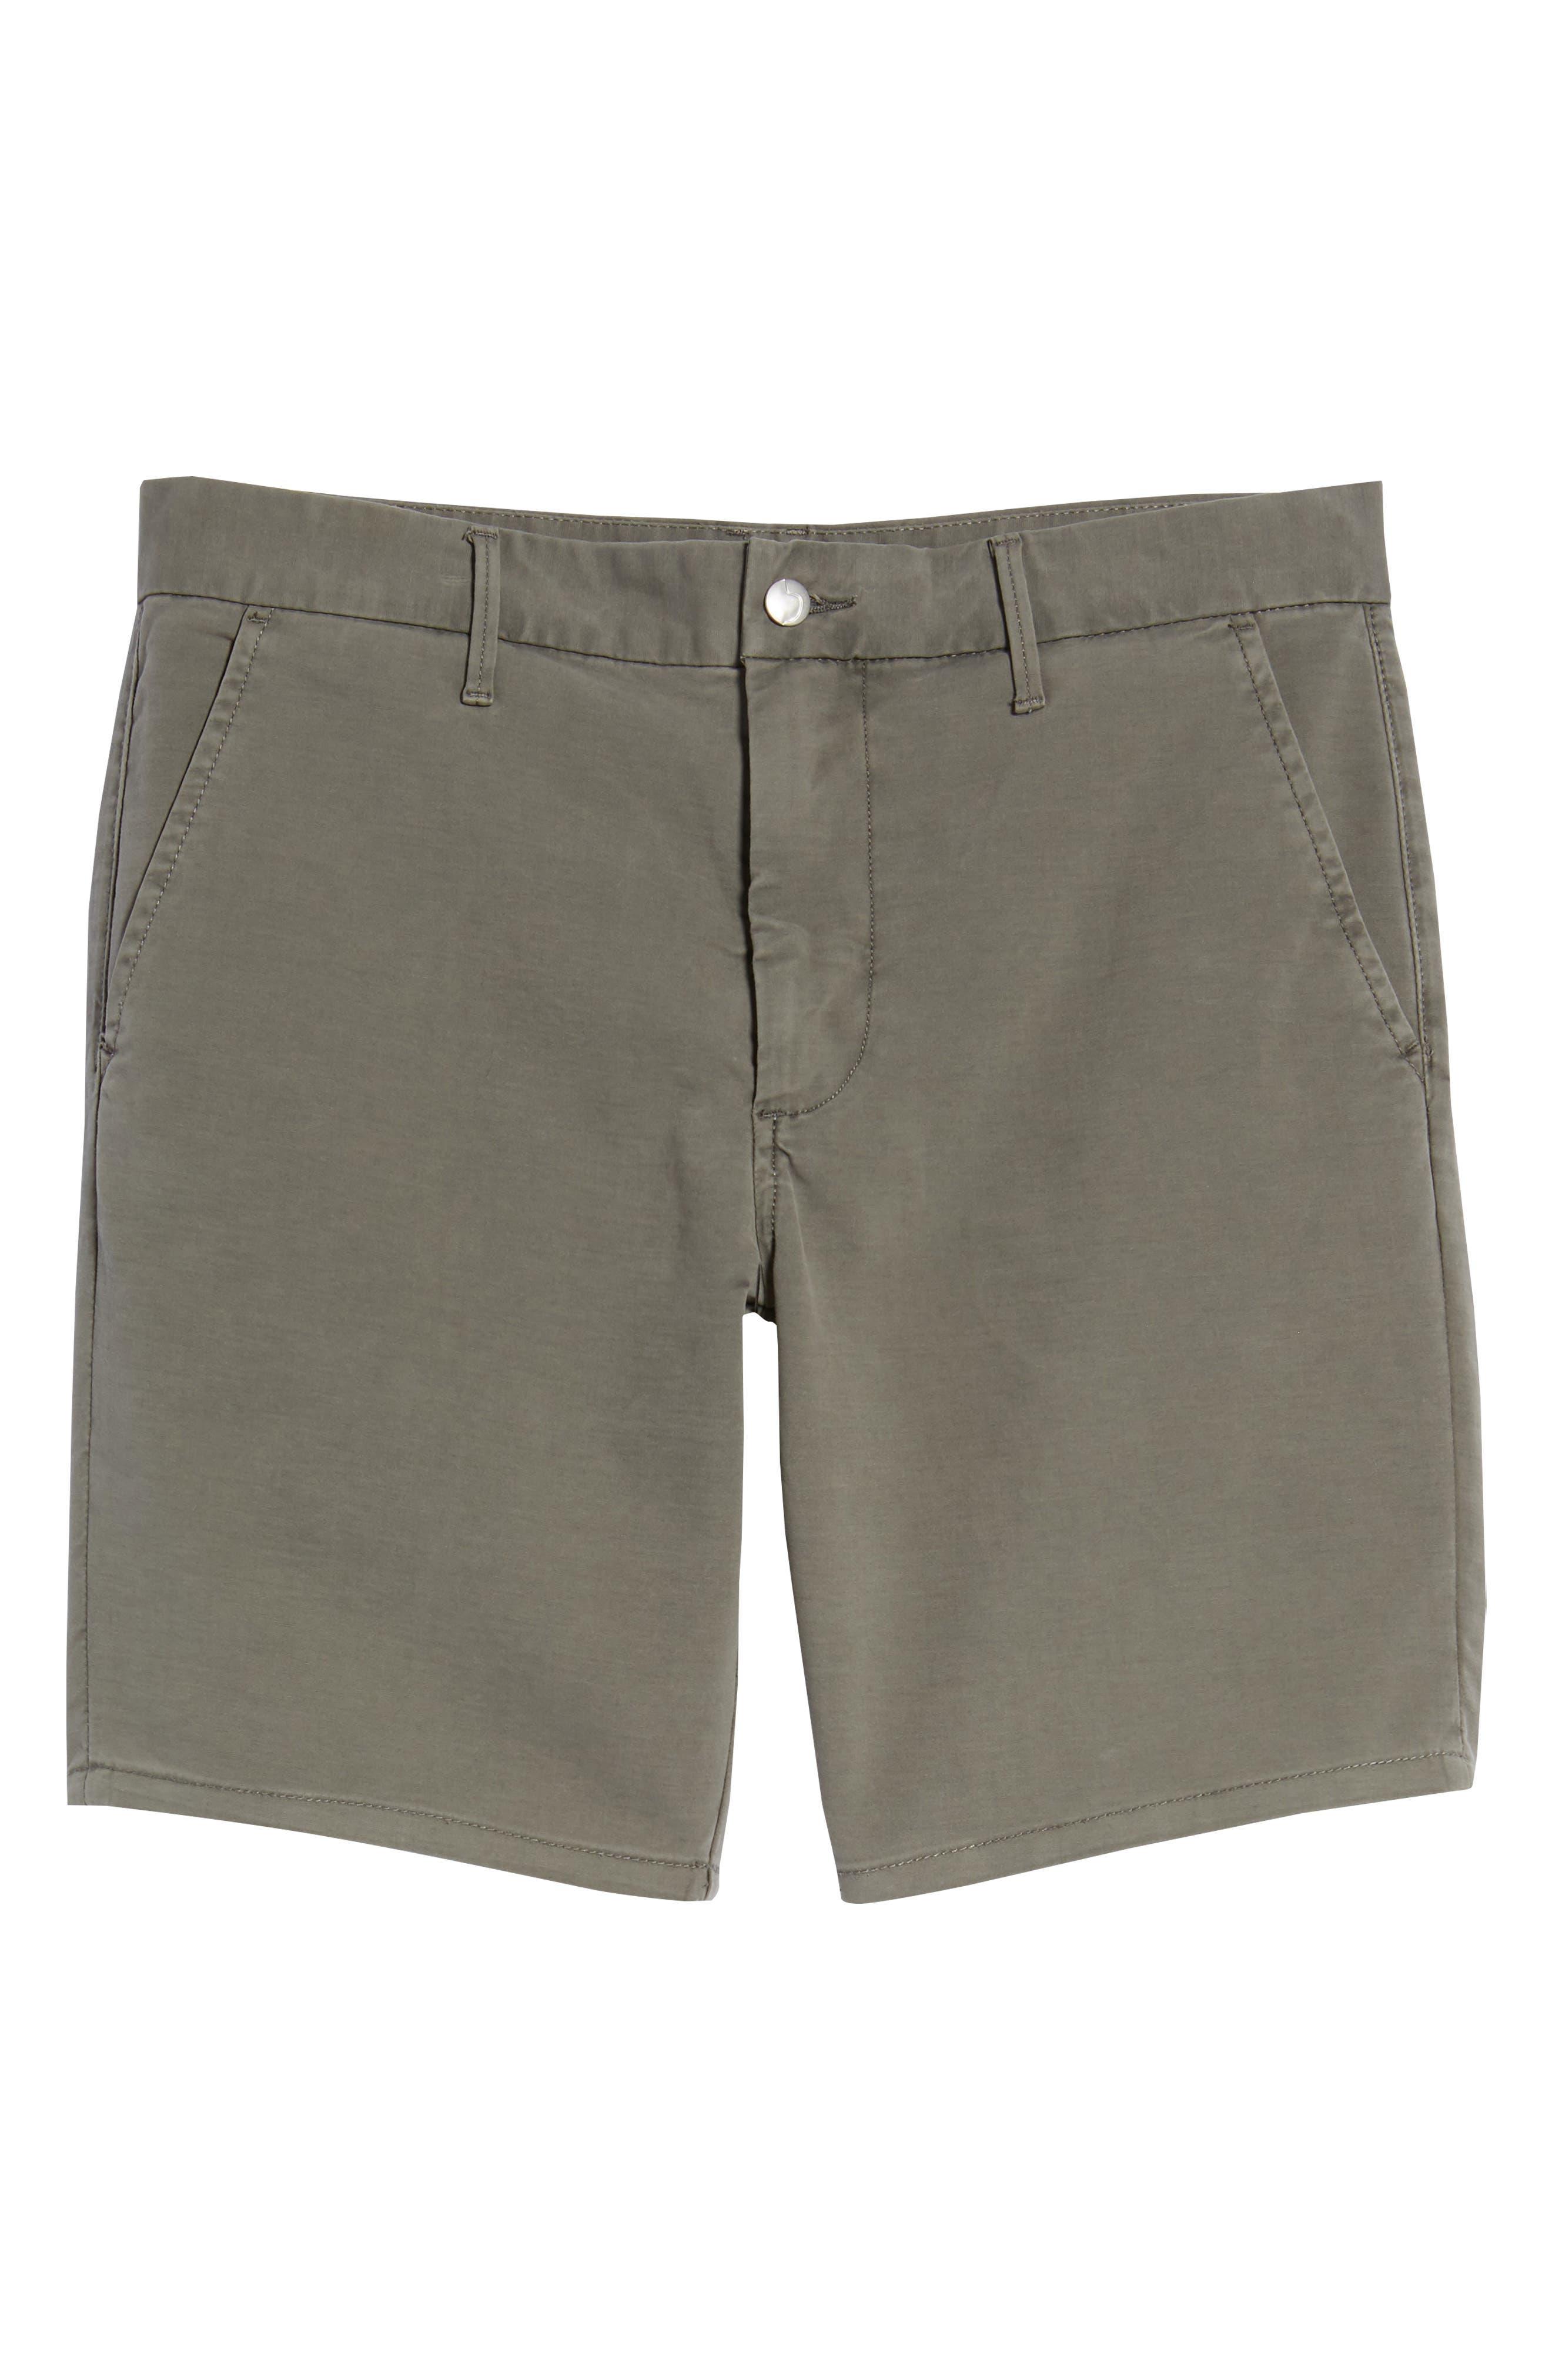 Brixton Trim Fit Straight Leg Shorts,                             Alternate thumbnail 6, color,                             020